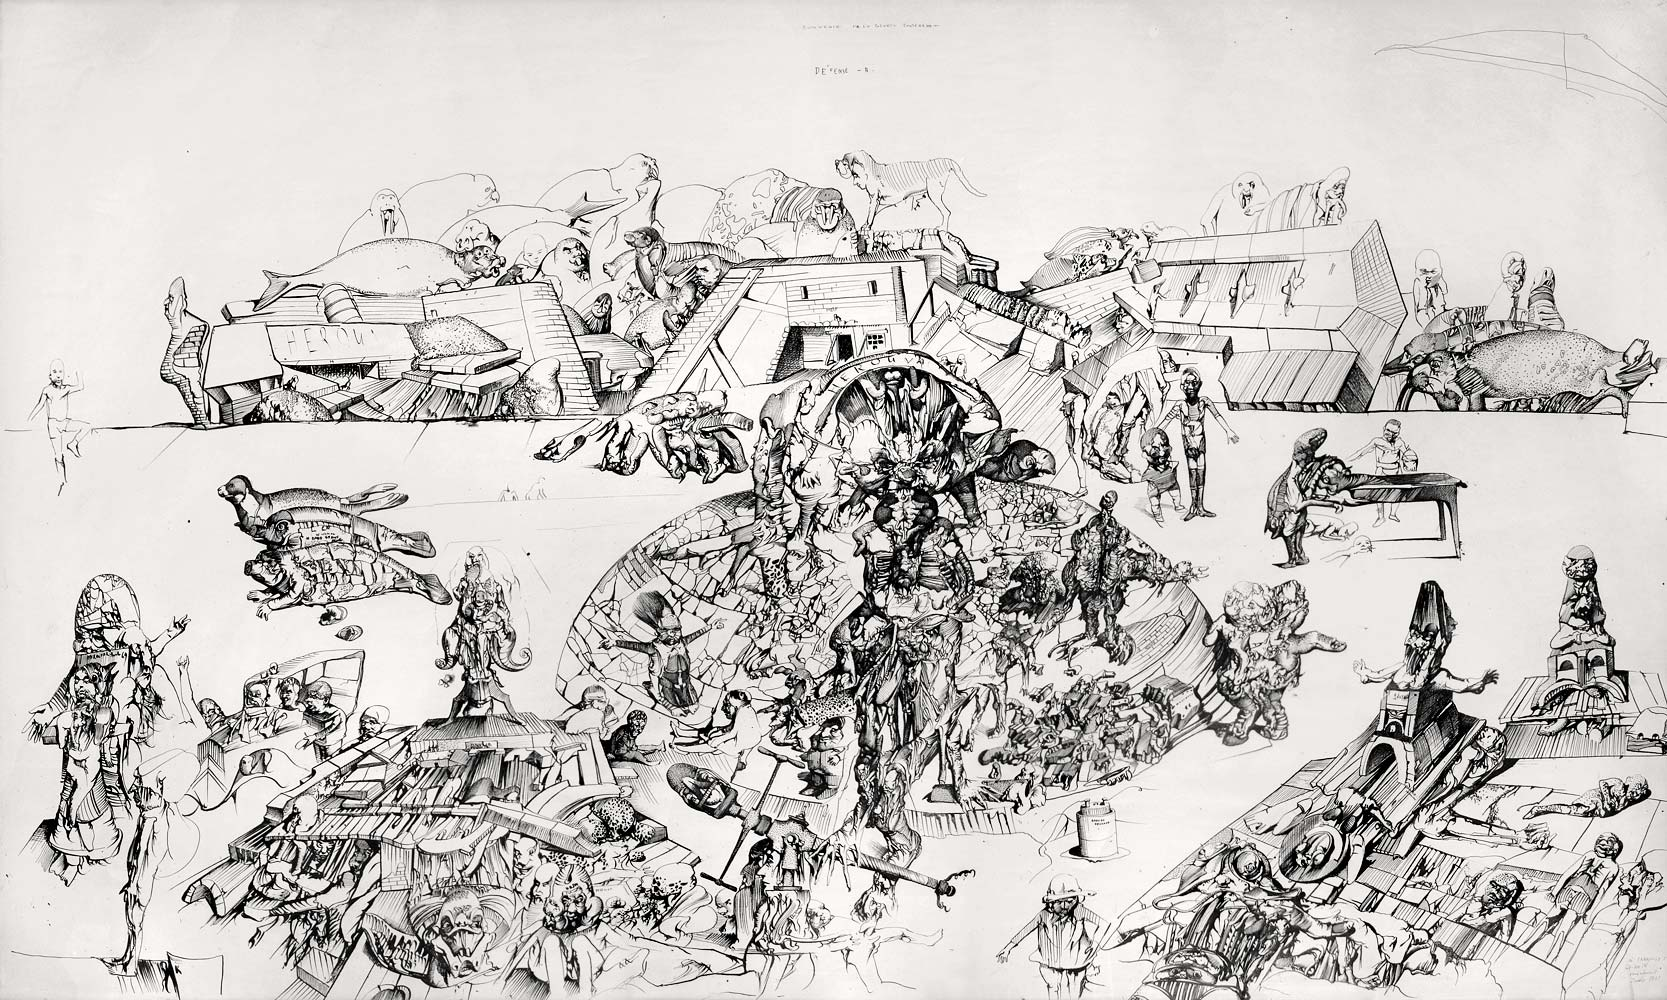 dessin de dado souvenir de la guerre souterraine 1971